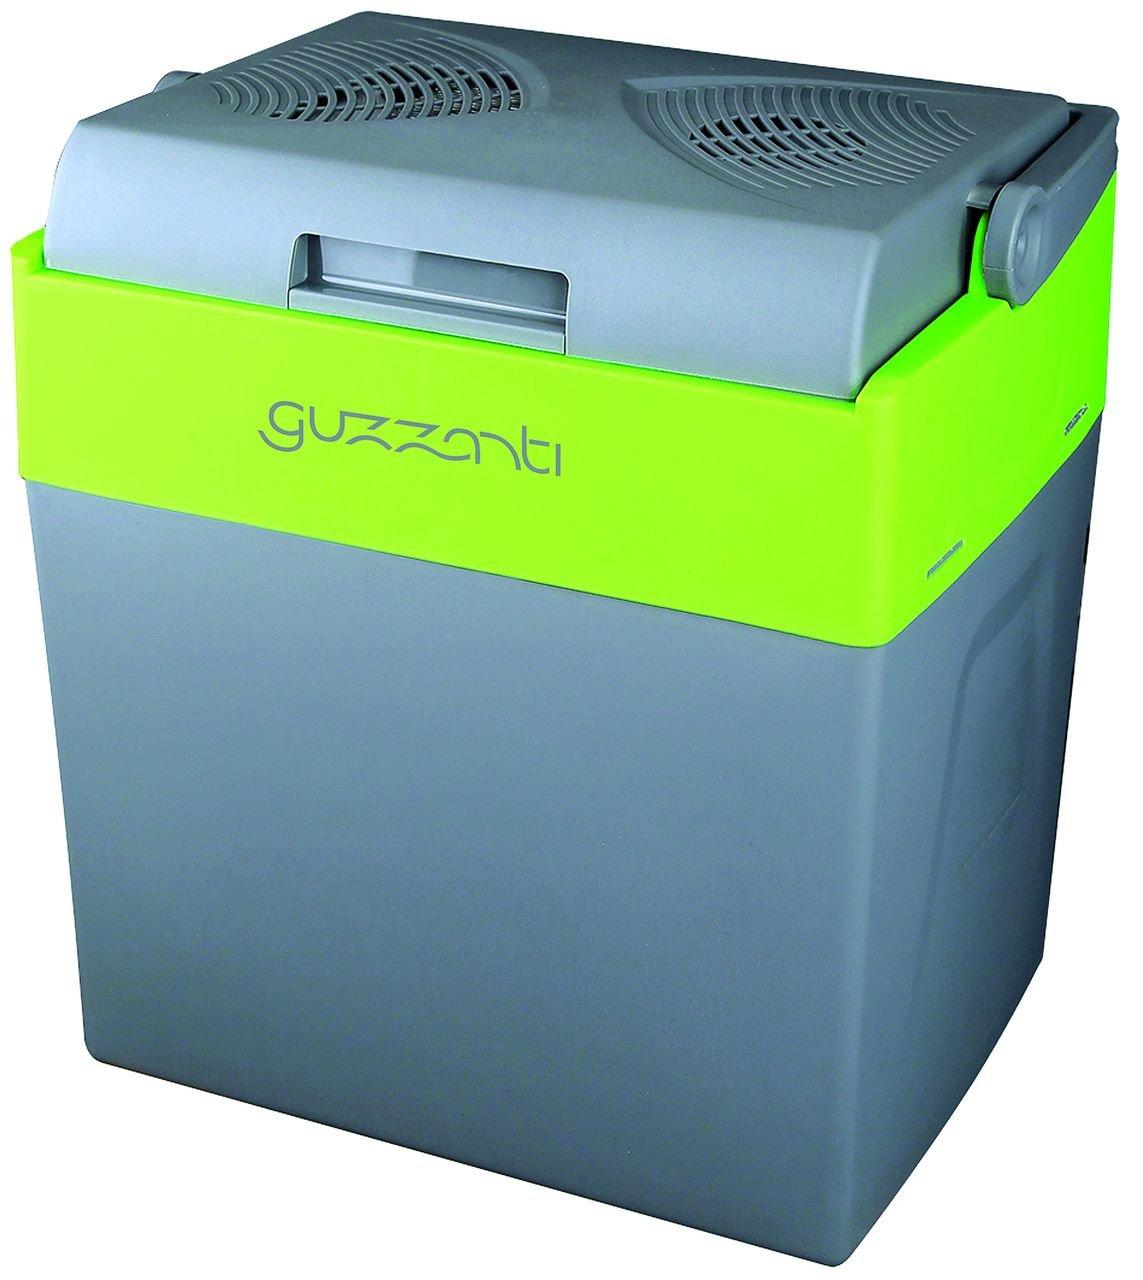 Guzzanti GZ 30B Thermoelektrische Kühlbox mit Aufwärmfunktion, Grau, 30 l